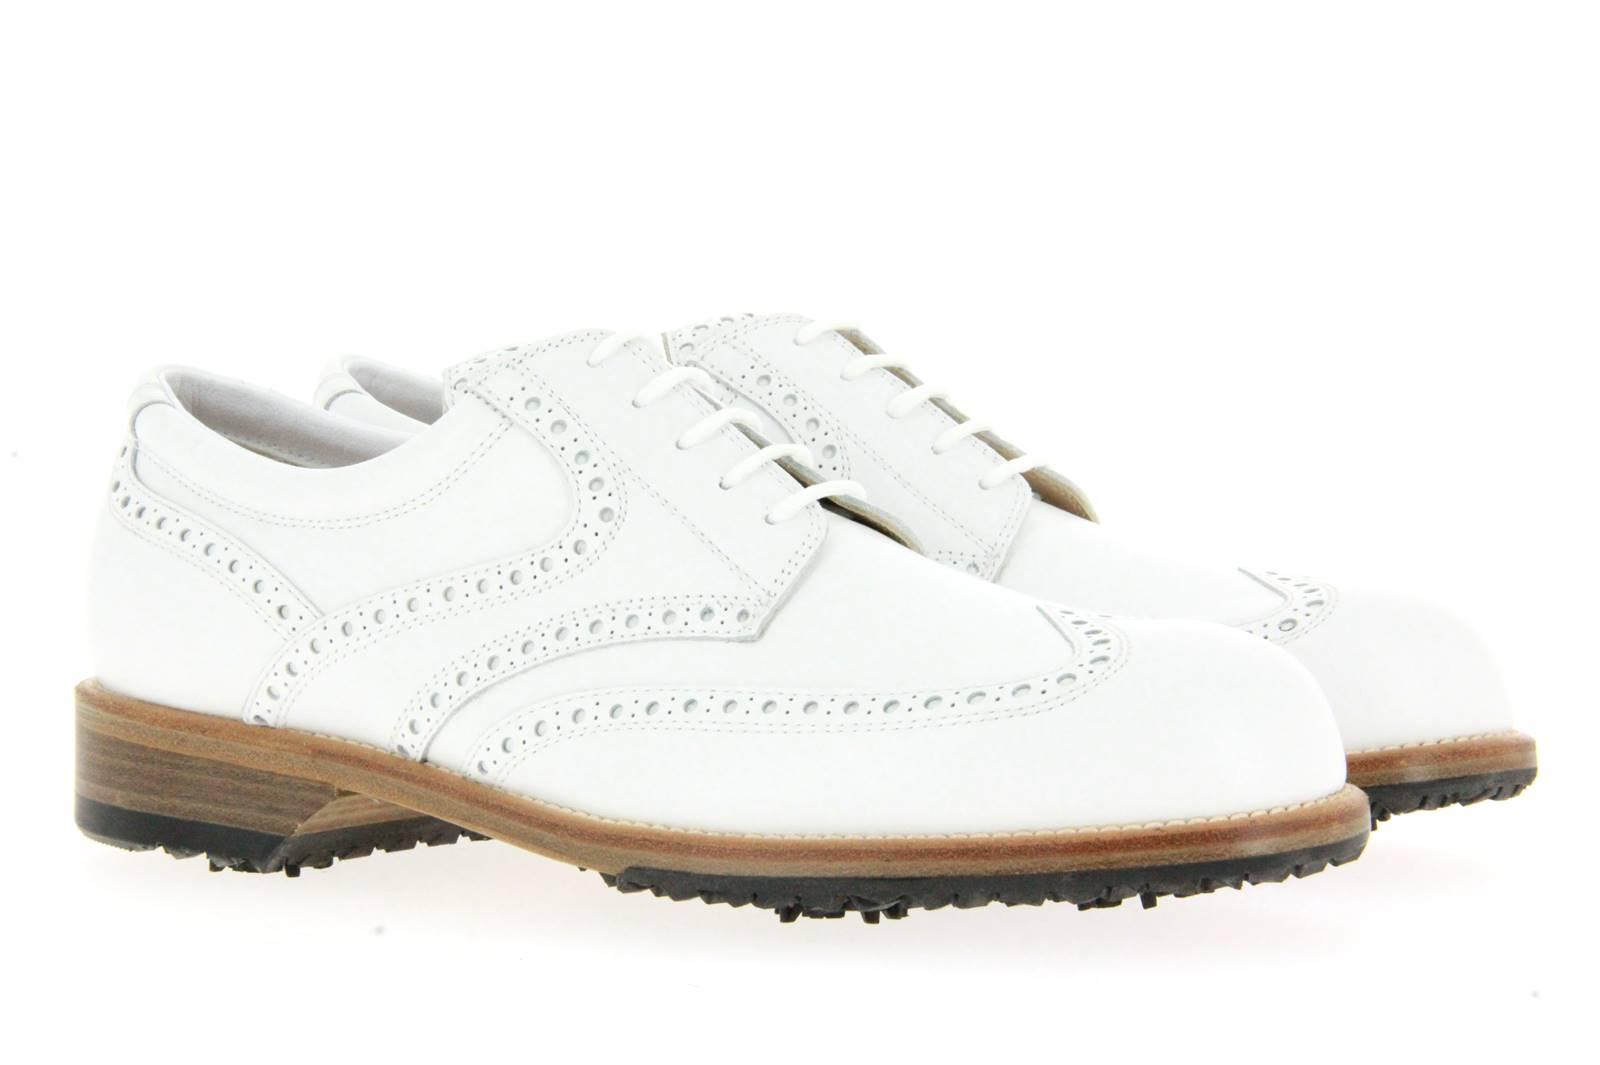 Tee Golf Shoes Herren- Golfschuh TOMMY BIANCO (40½)